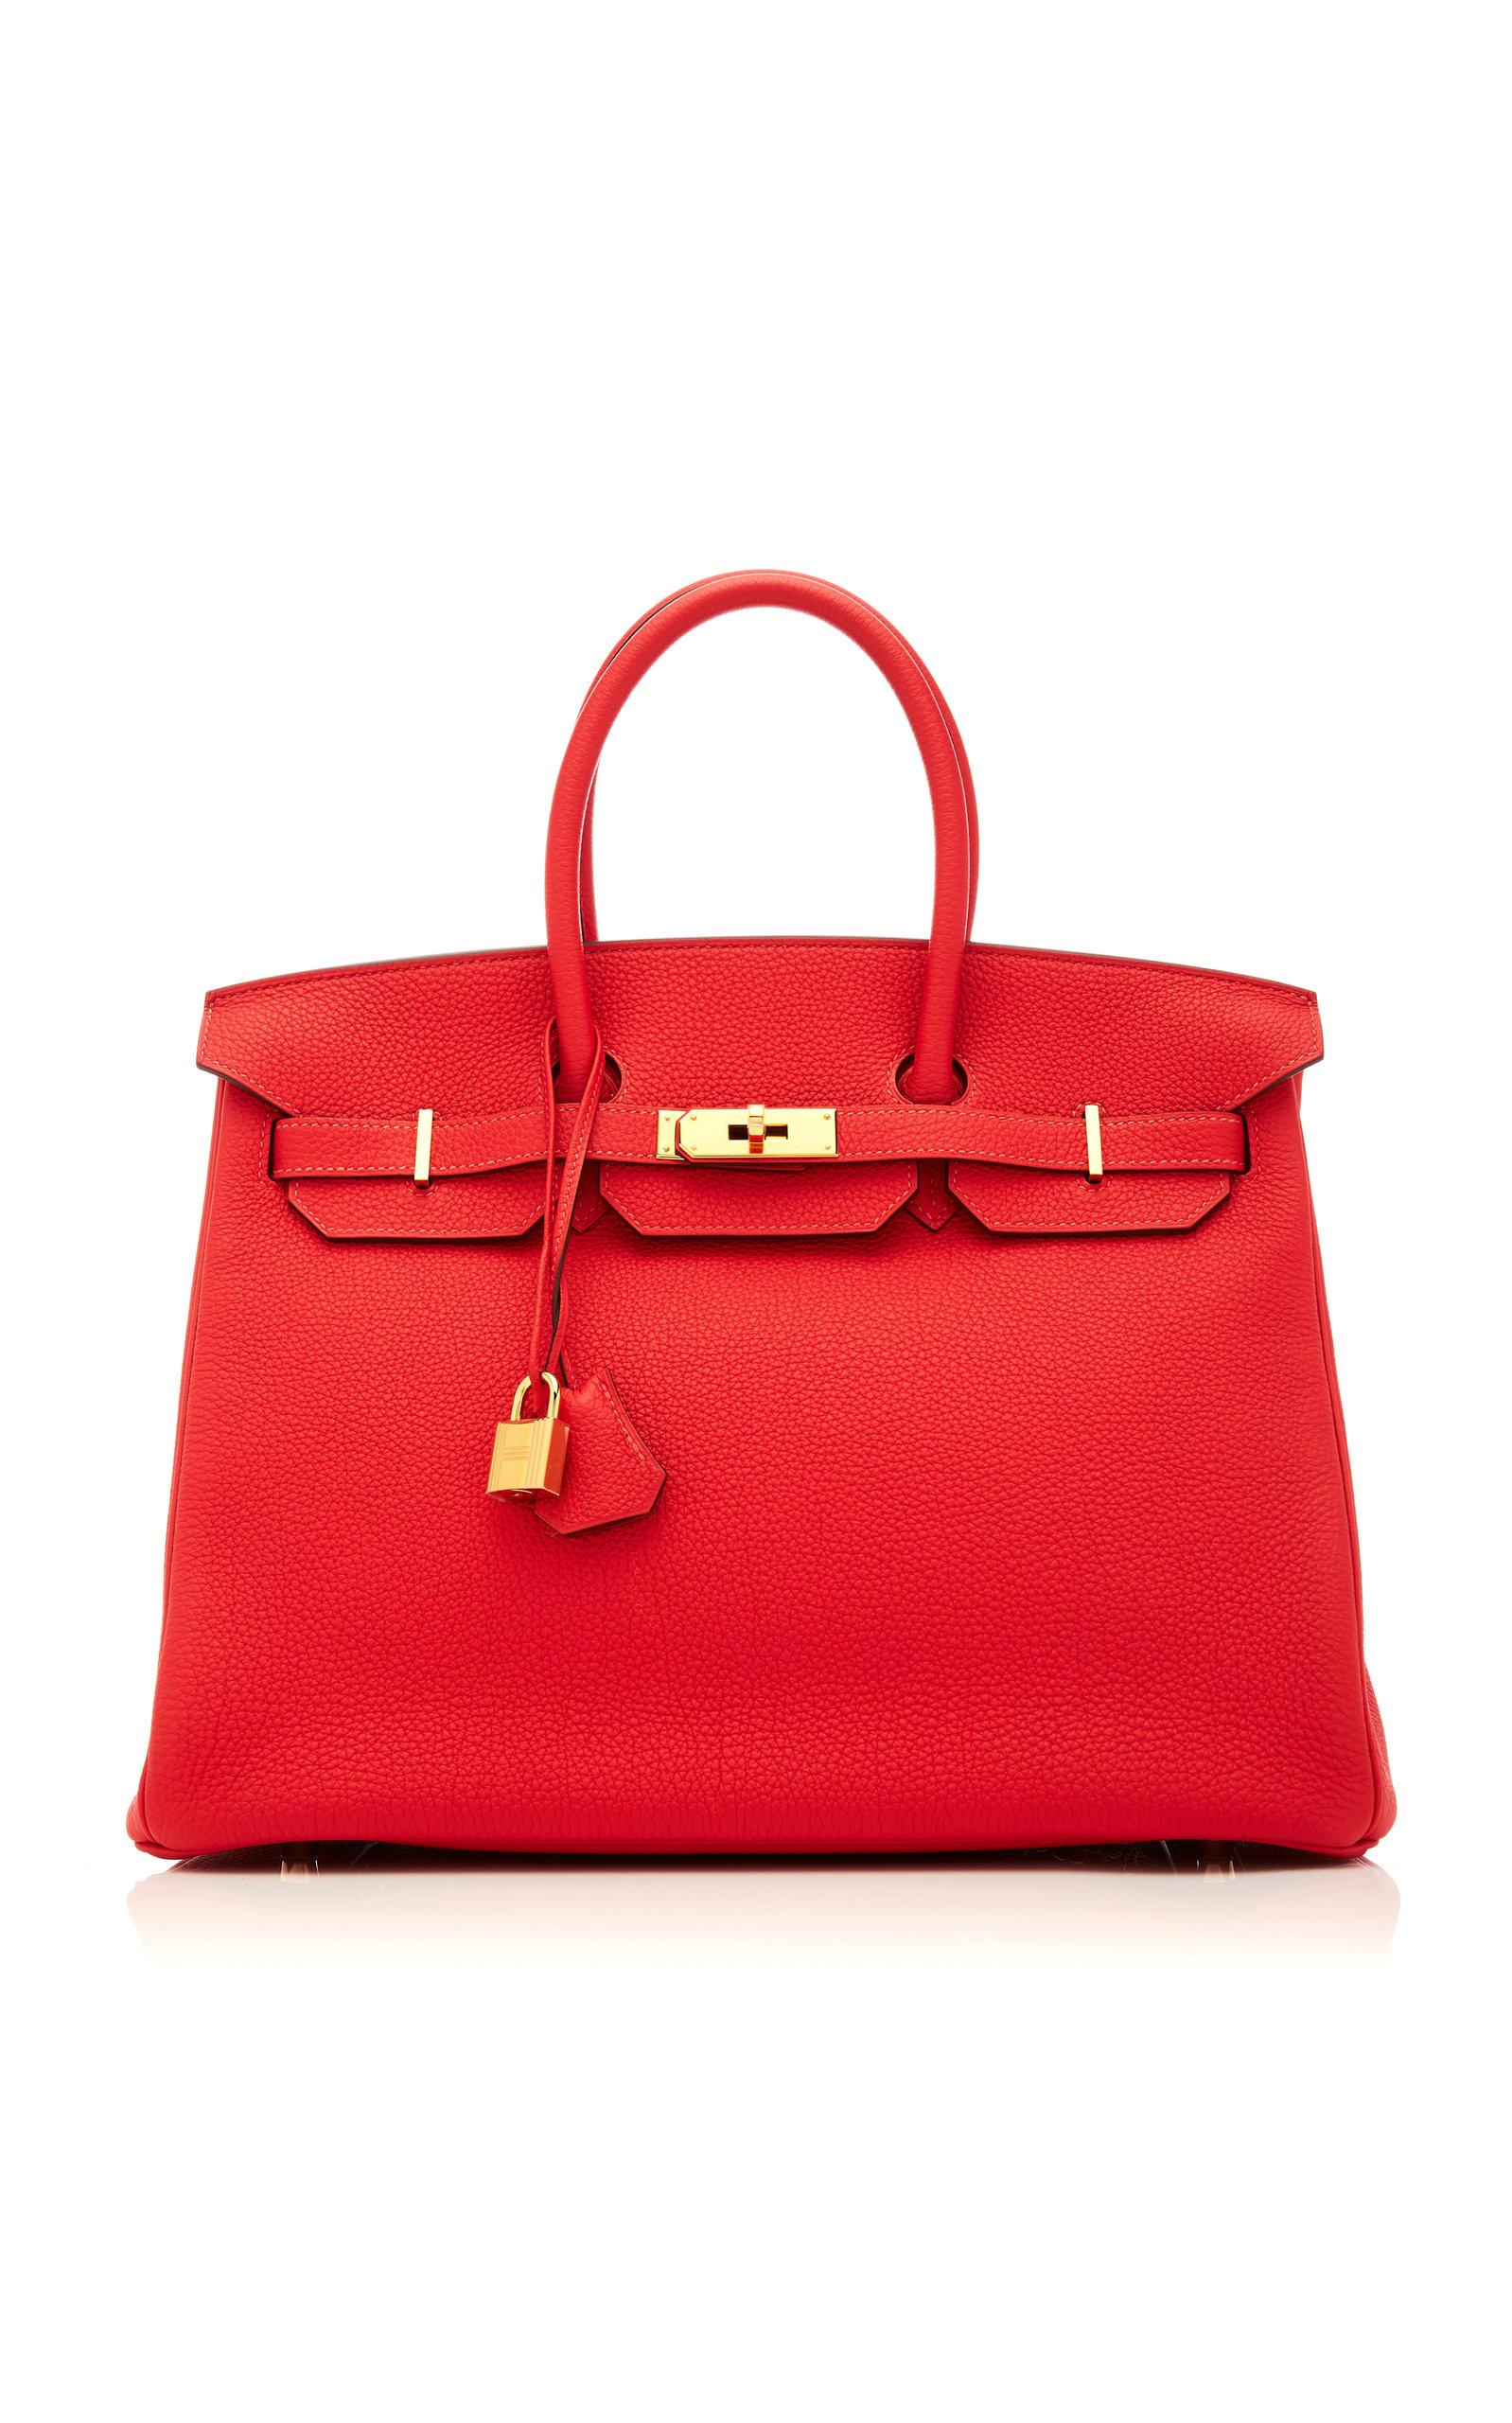 HermÈS Vintage By Heritage Auctions HermÈS 35Cm Rouge Pivoine Togo Leather Birkin In Red